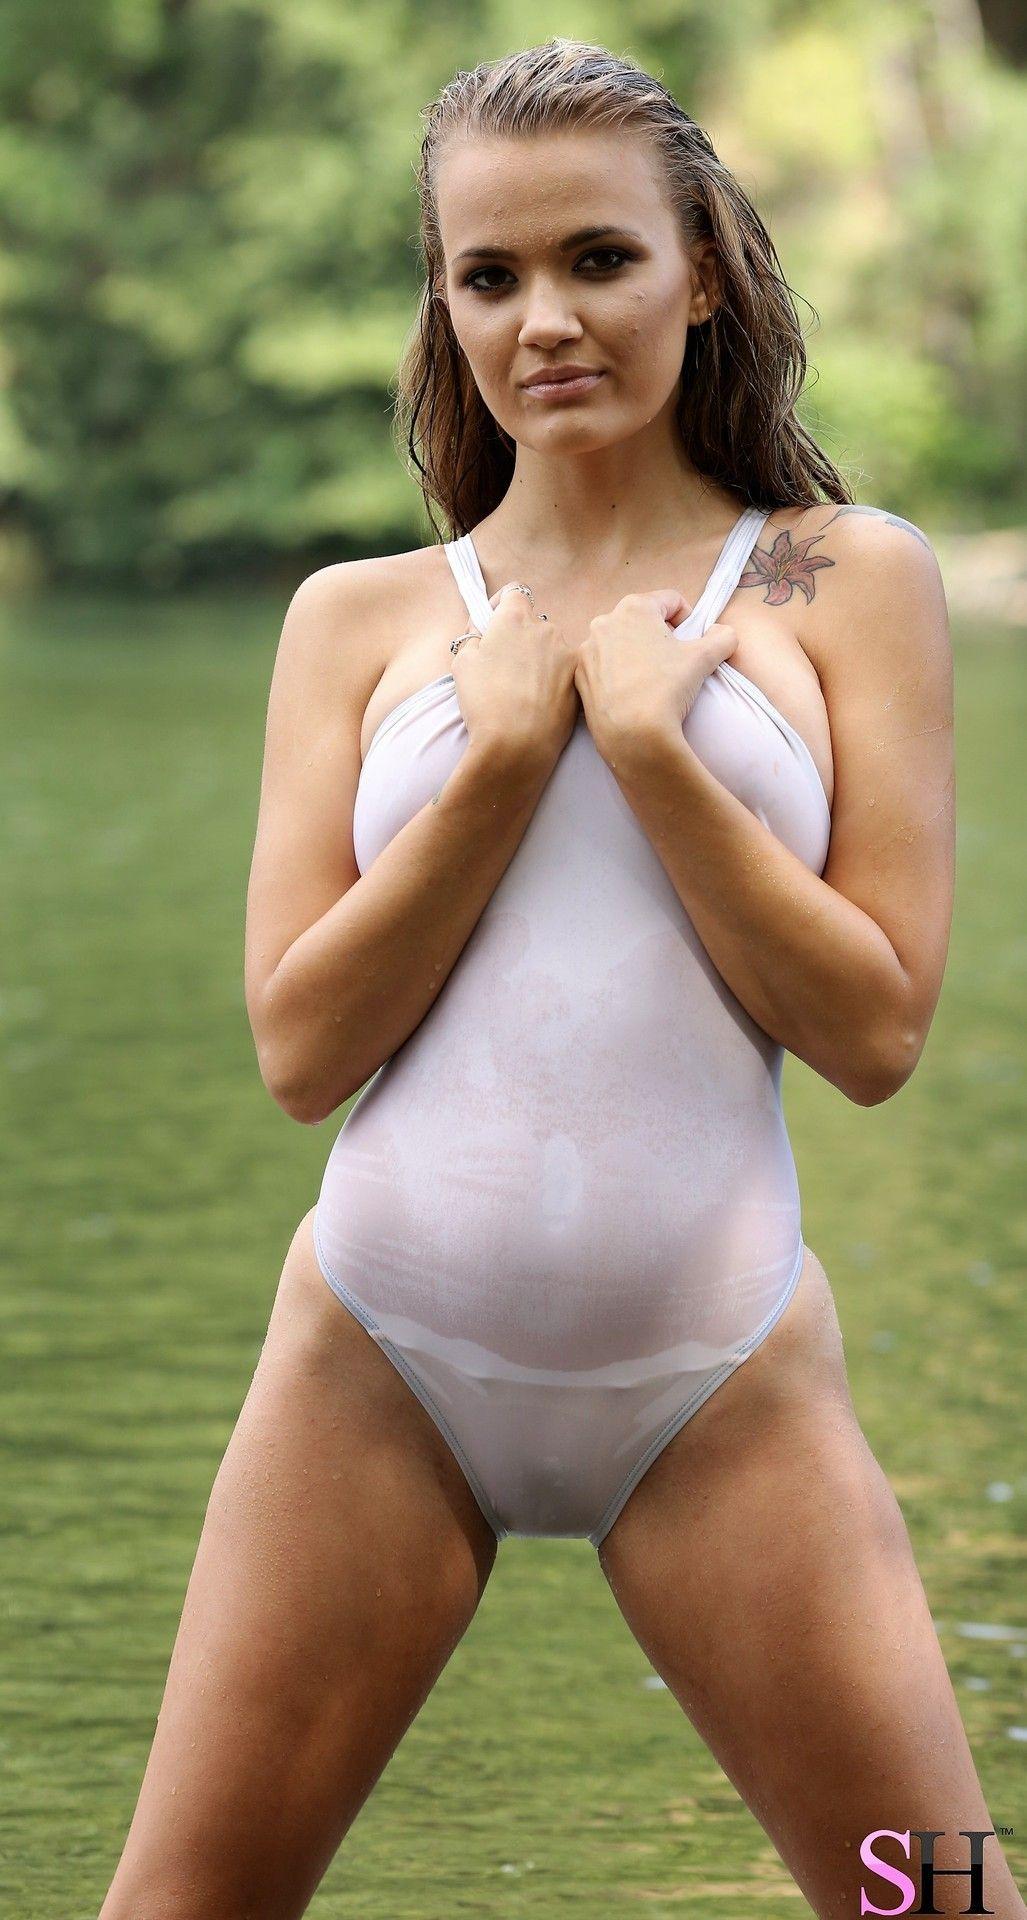 Samantha pussy nude xossip